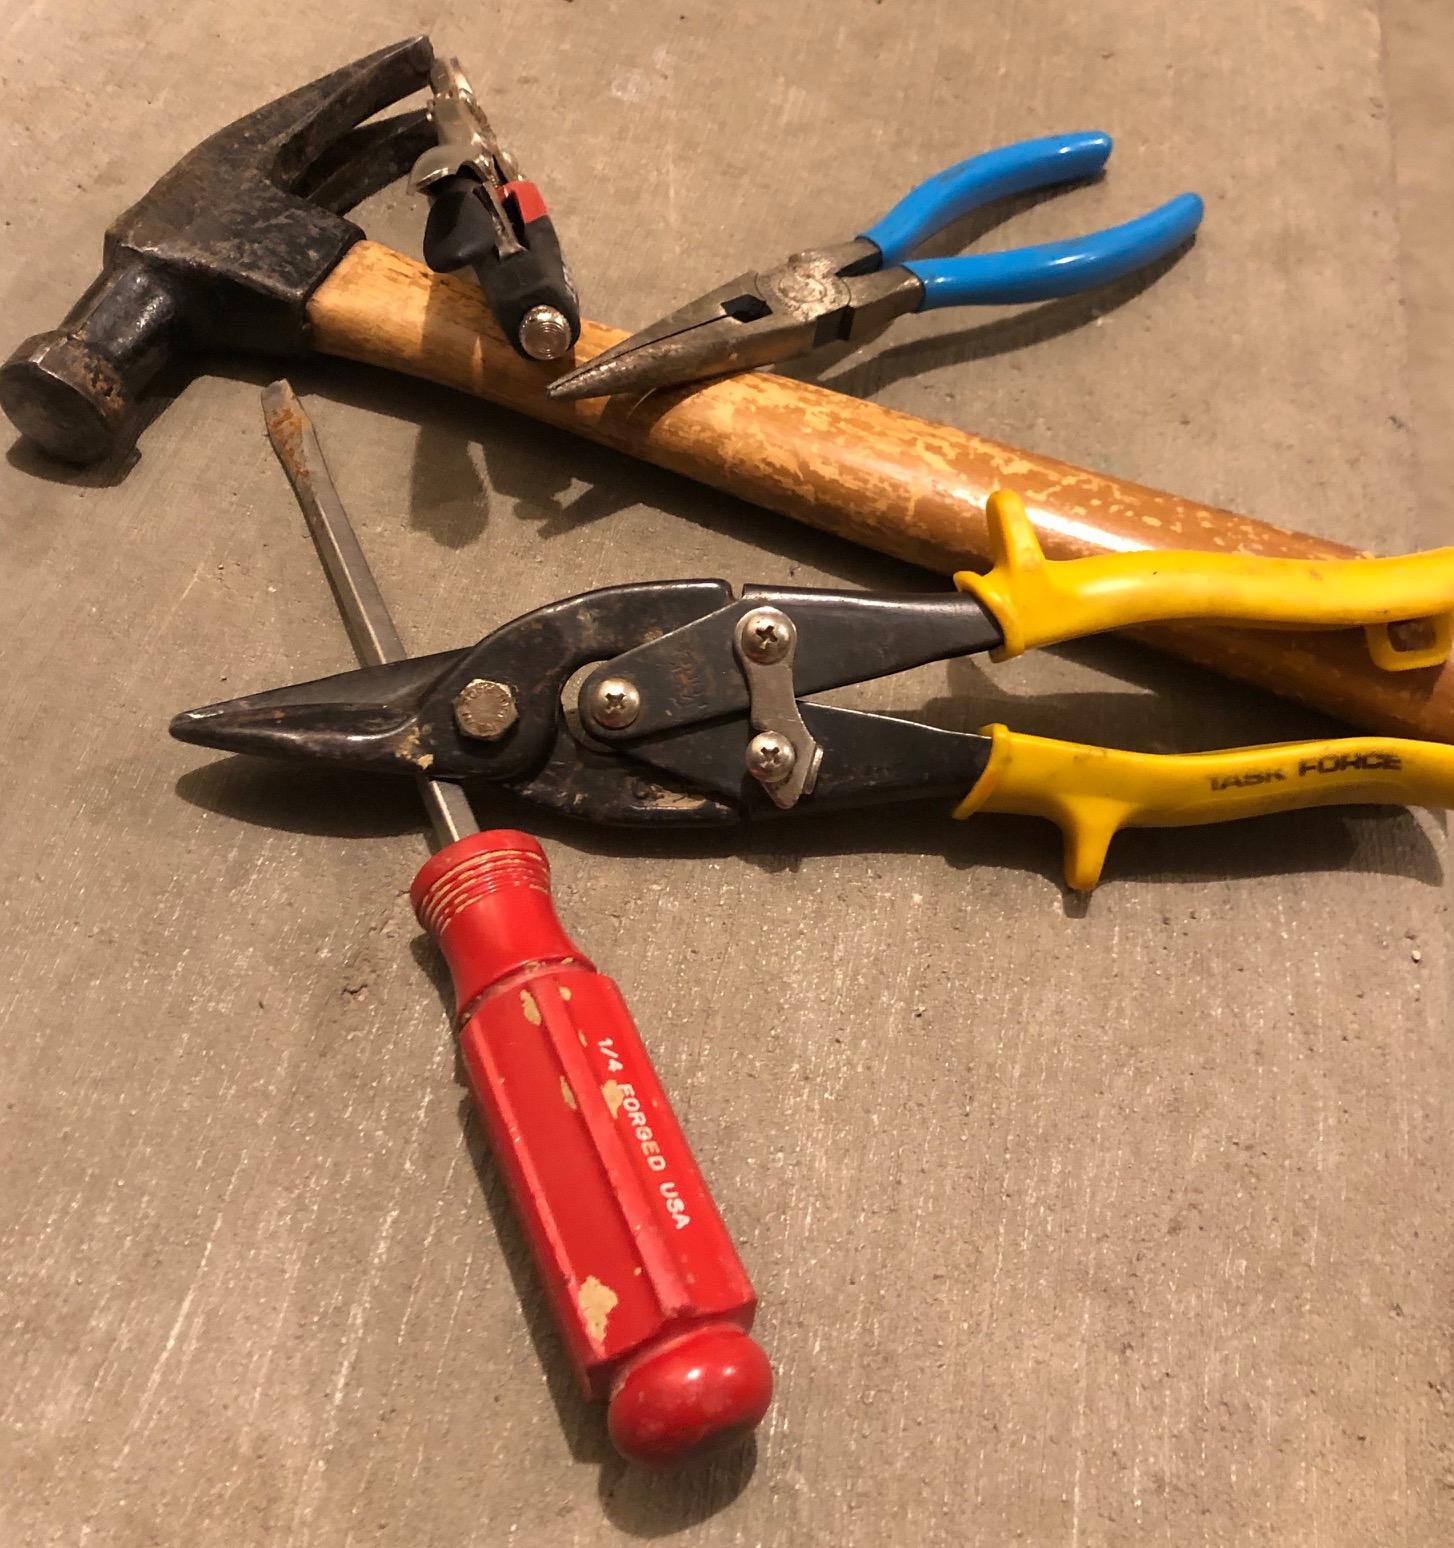 Monthly Maintenance Tasks